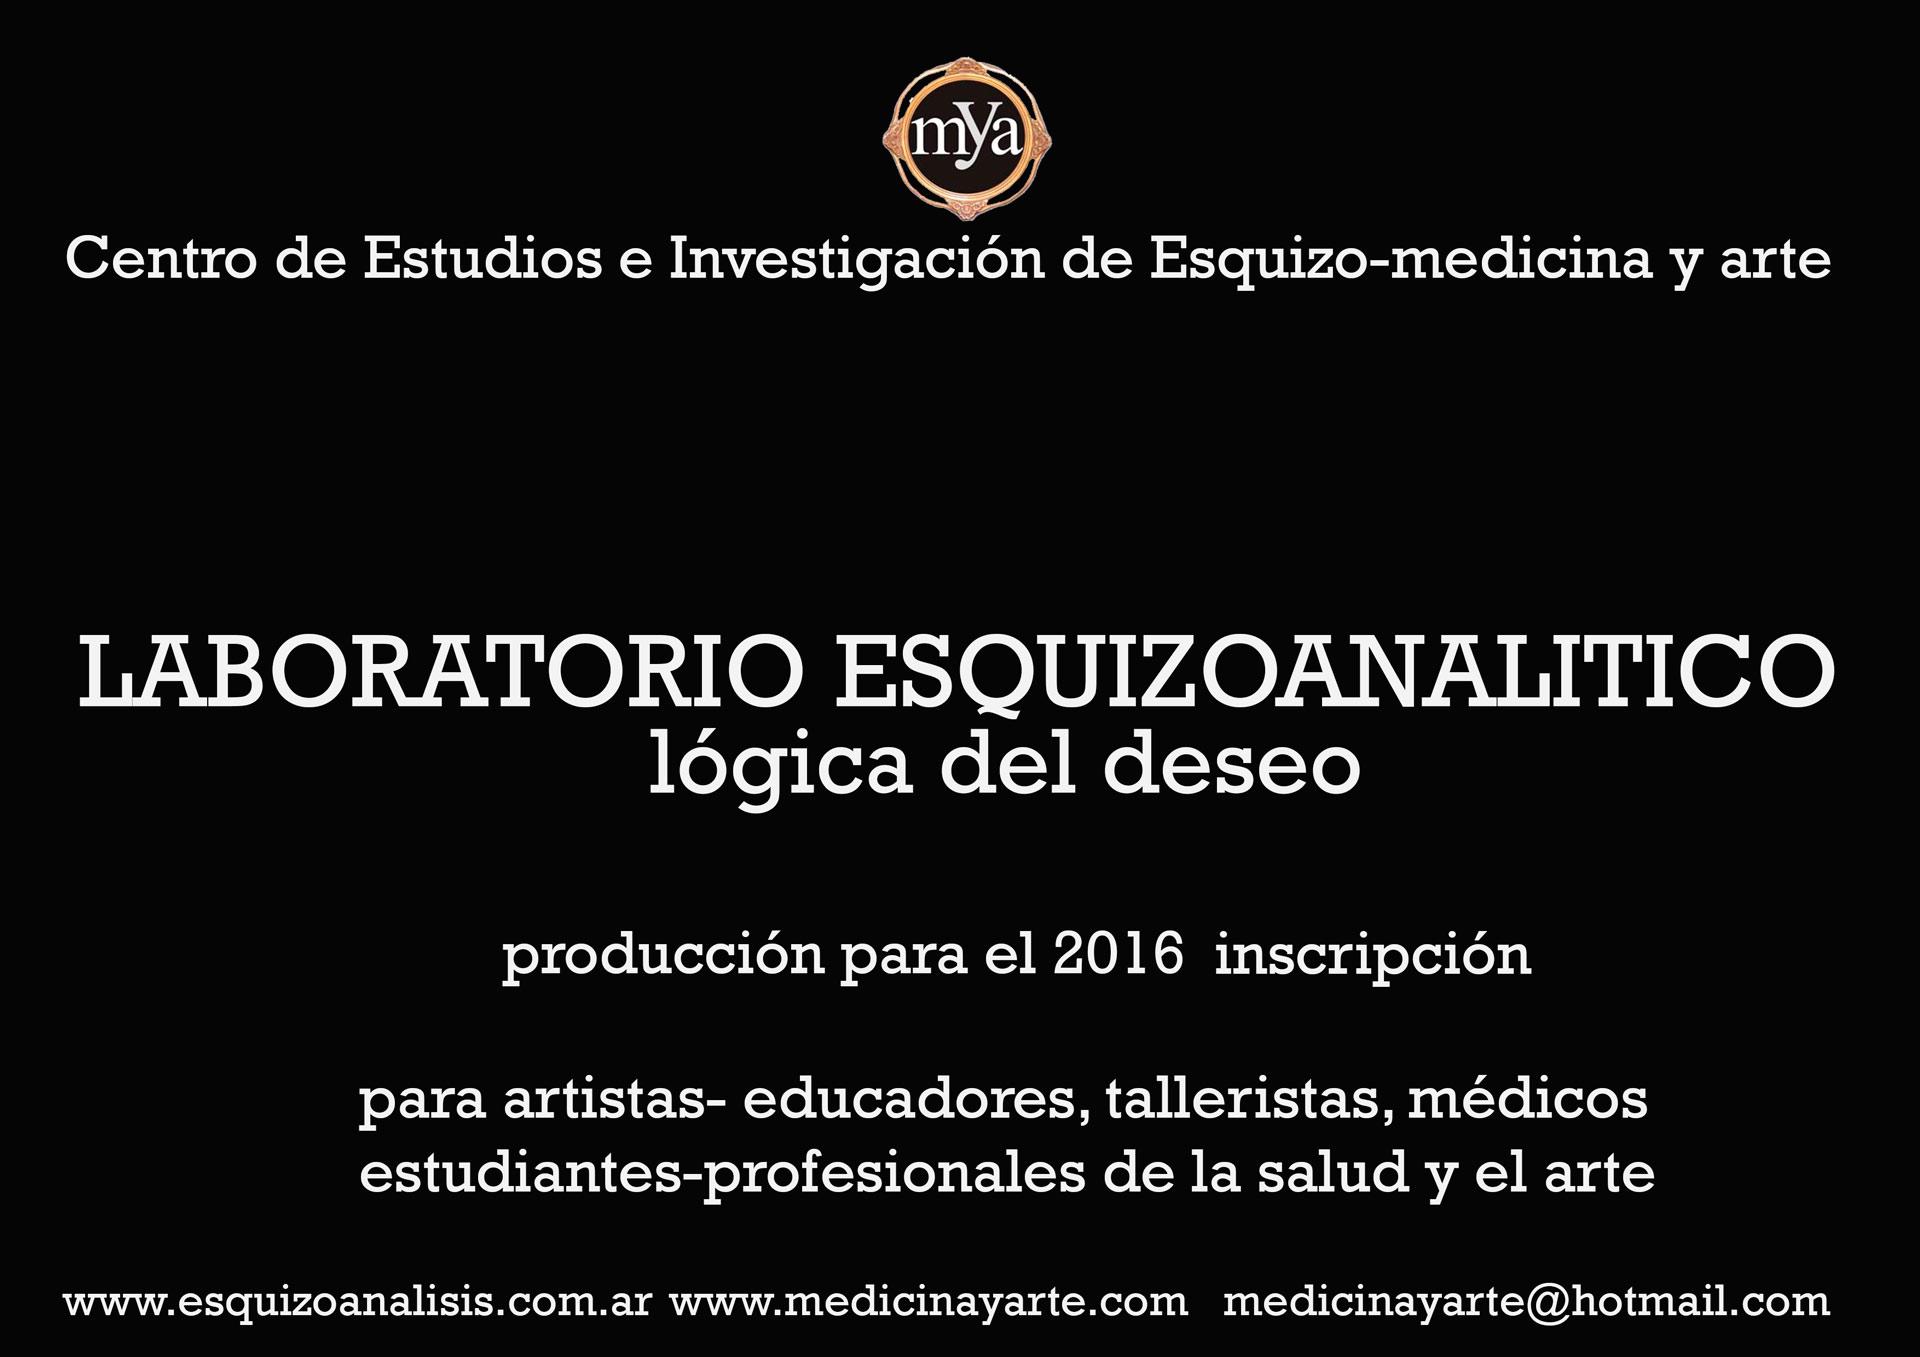 http://www.medicinayarte.com/img/laboratorio-5.jpg